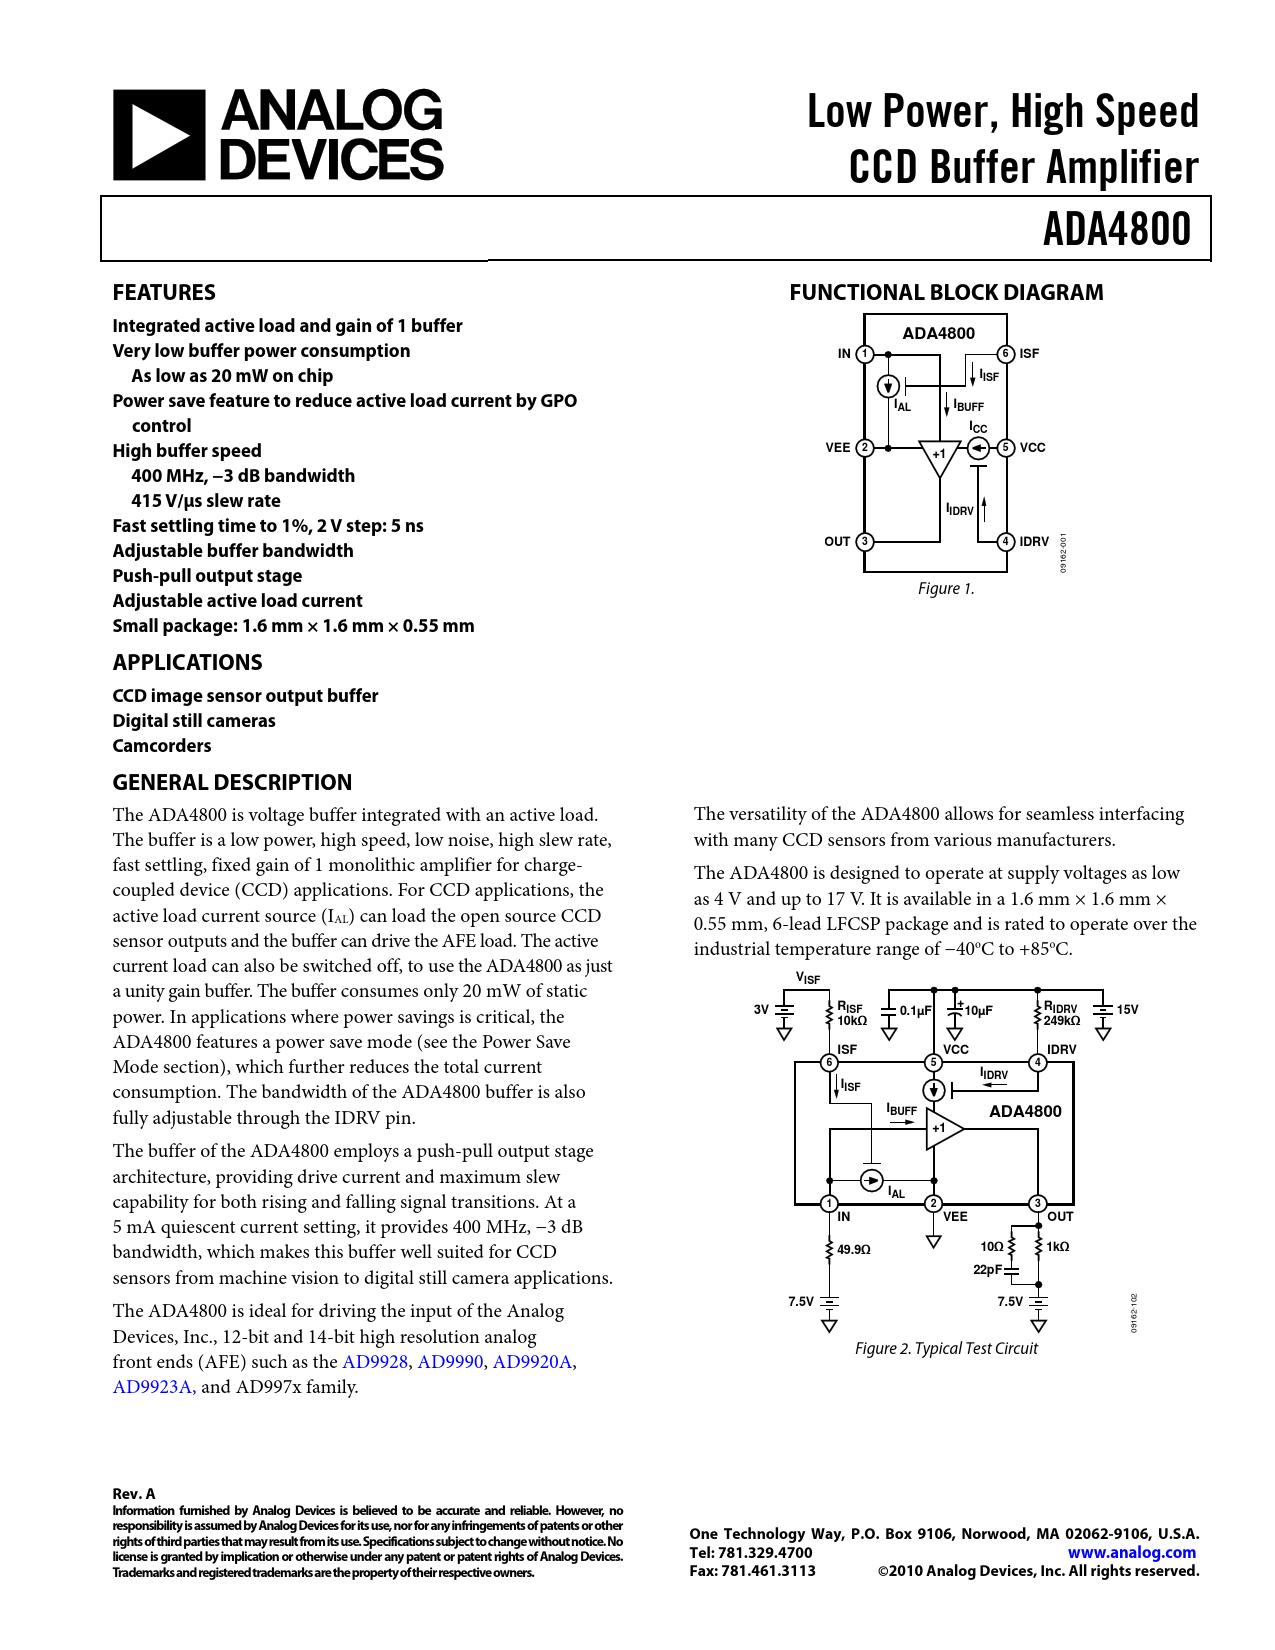 Datasheet ADA4800 Analog Devices, Версия: A